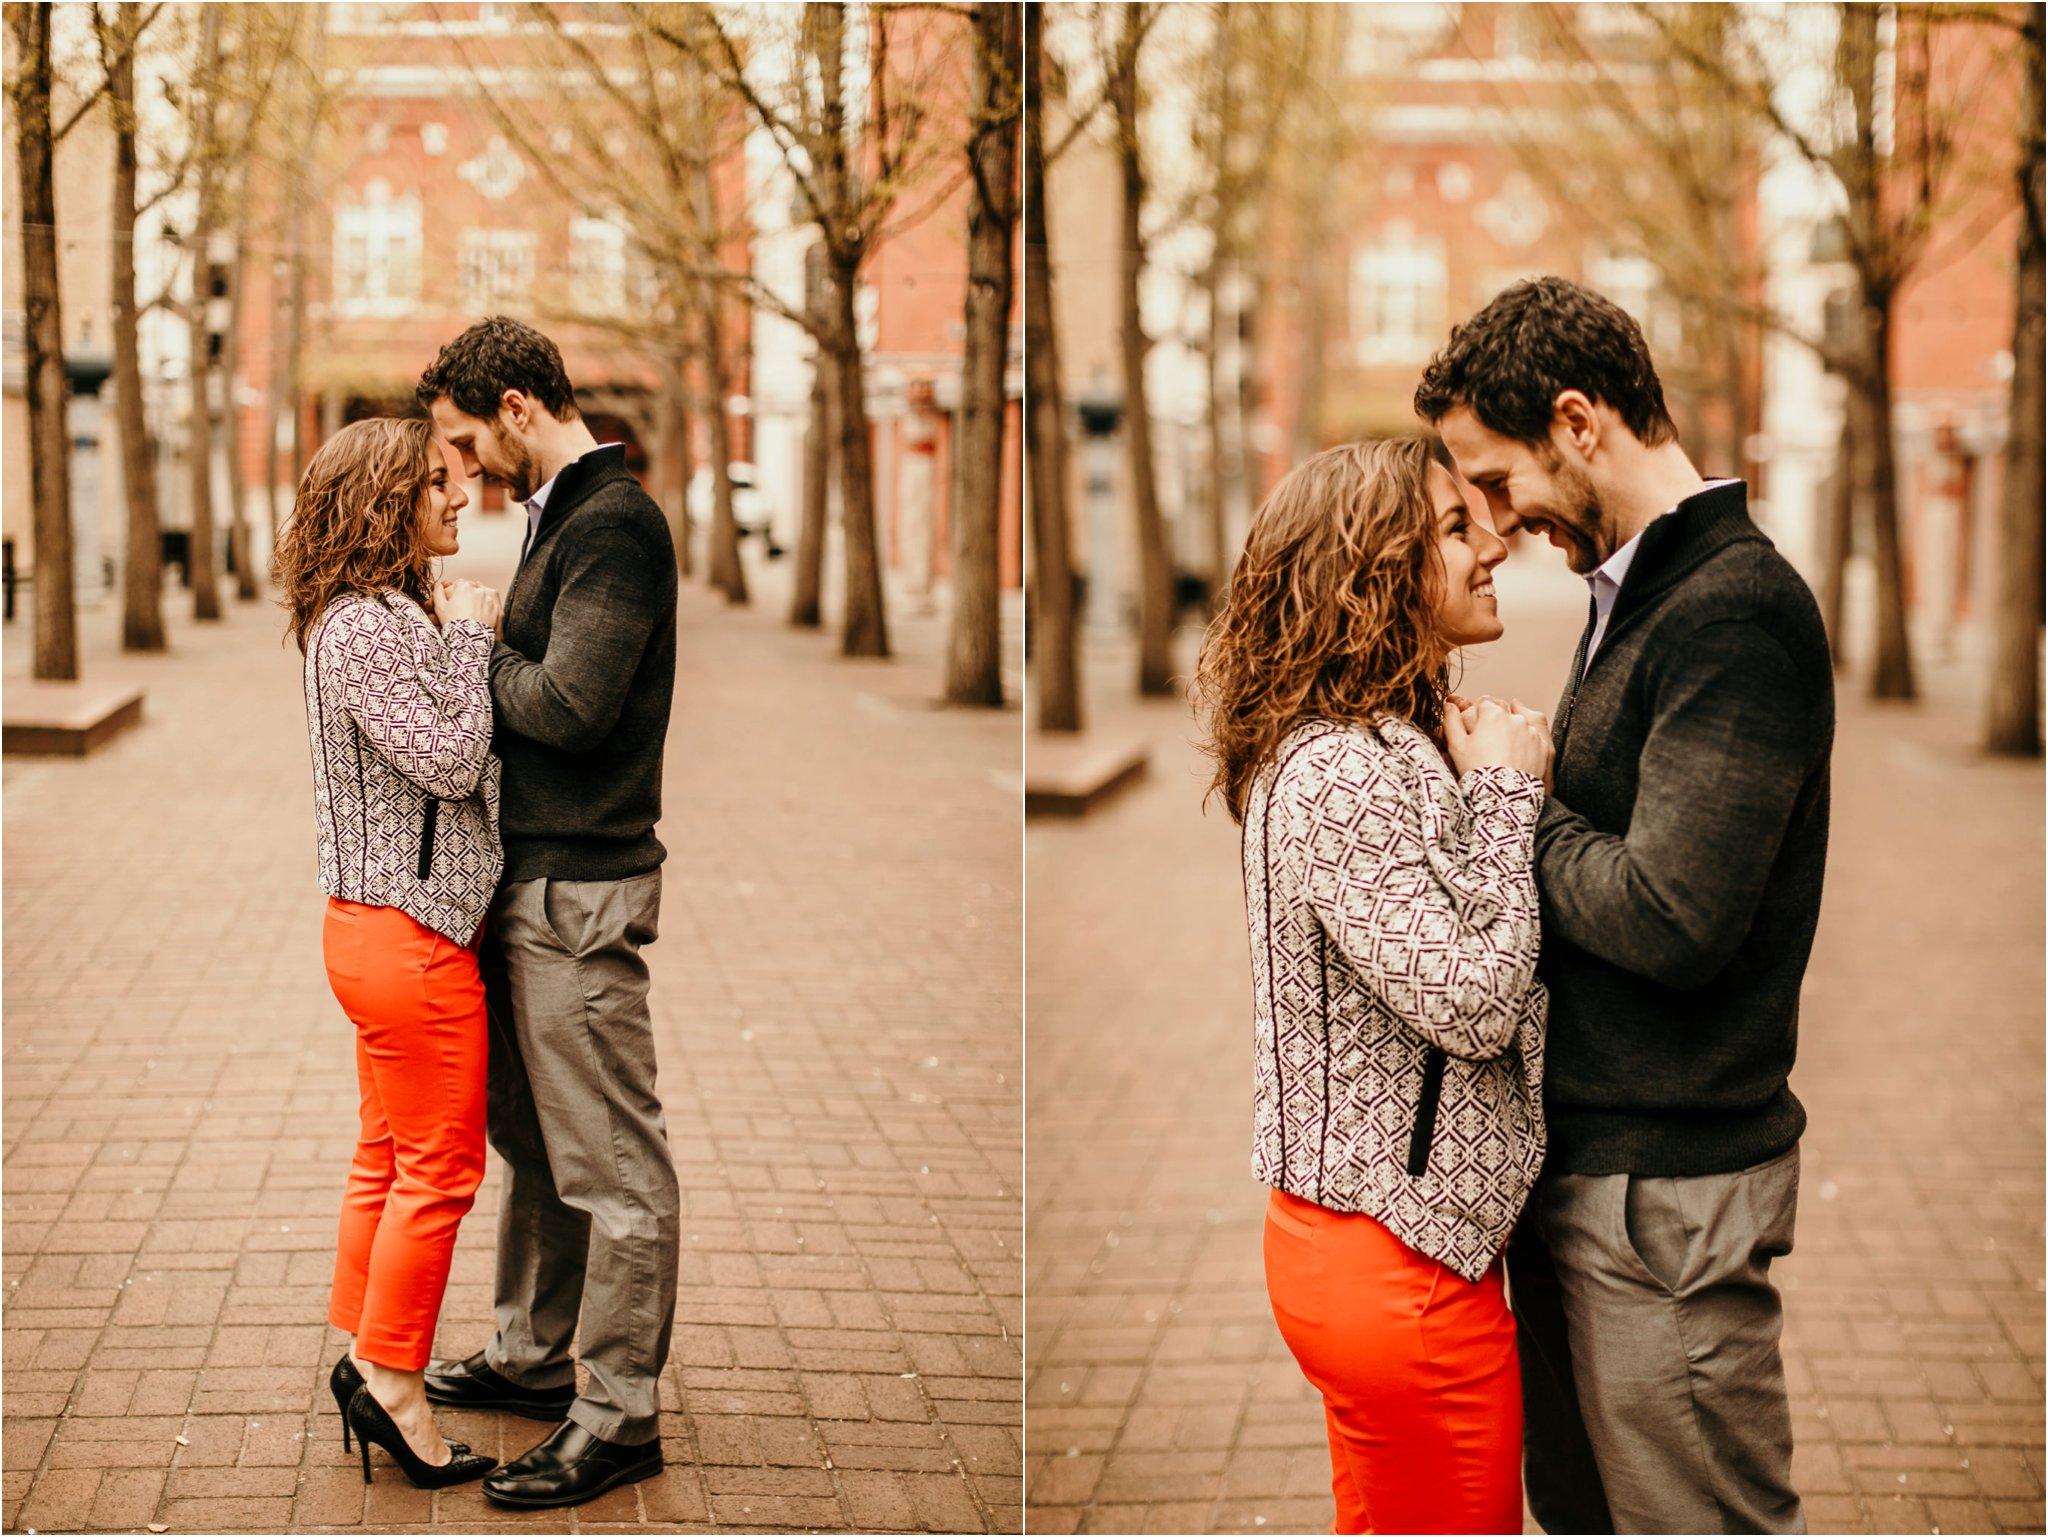 Engagement - Downtown Roanoke - Virginia - Wedding Photographer - Pat Cori Photography-30.jpg